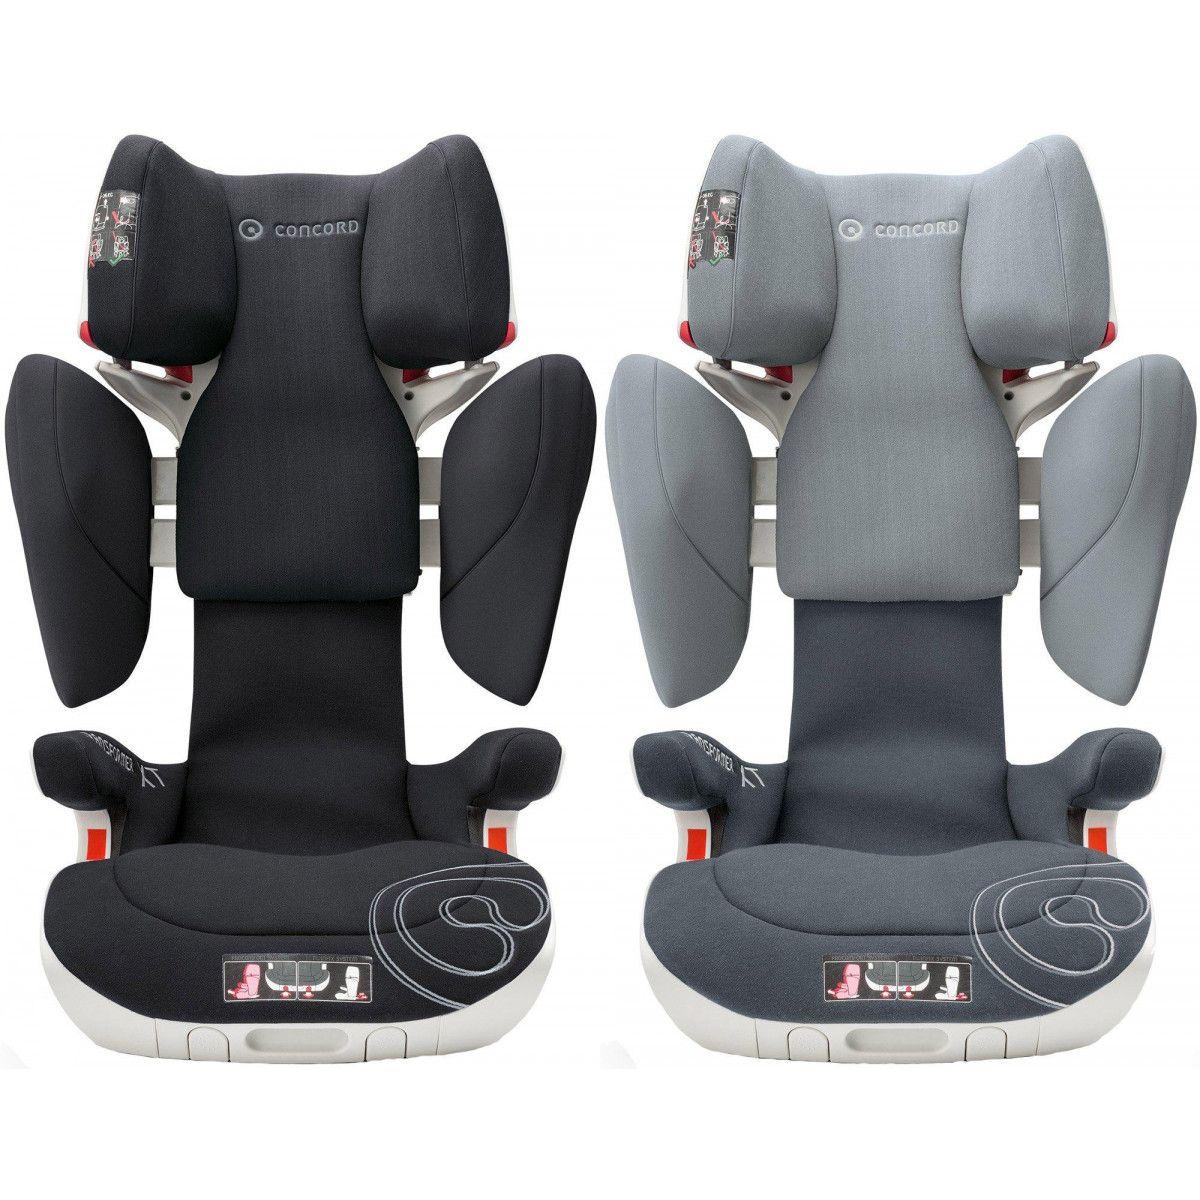 Concord Transformer XT Group 2/3 Car Seat | Car Seats | Pinterest ...